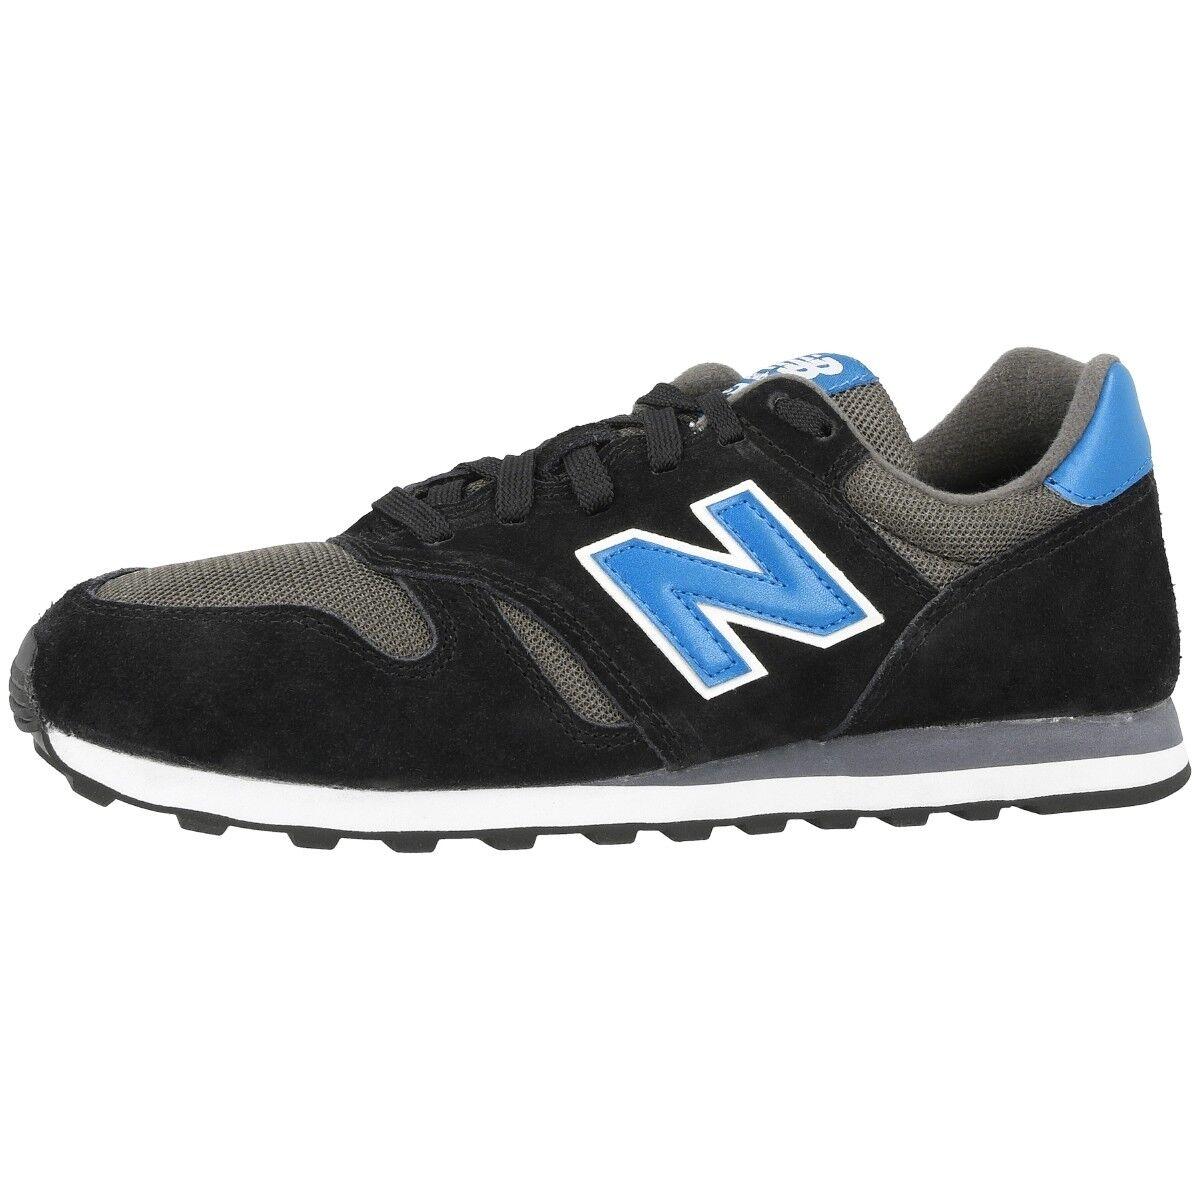 New casual Balance ml 373 SKB zapatos zapatillas casual New sneakers Negro Azul ml373skb f77bb2